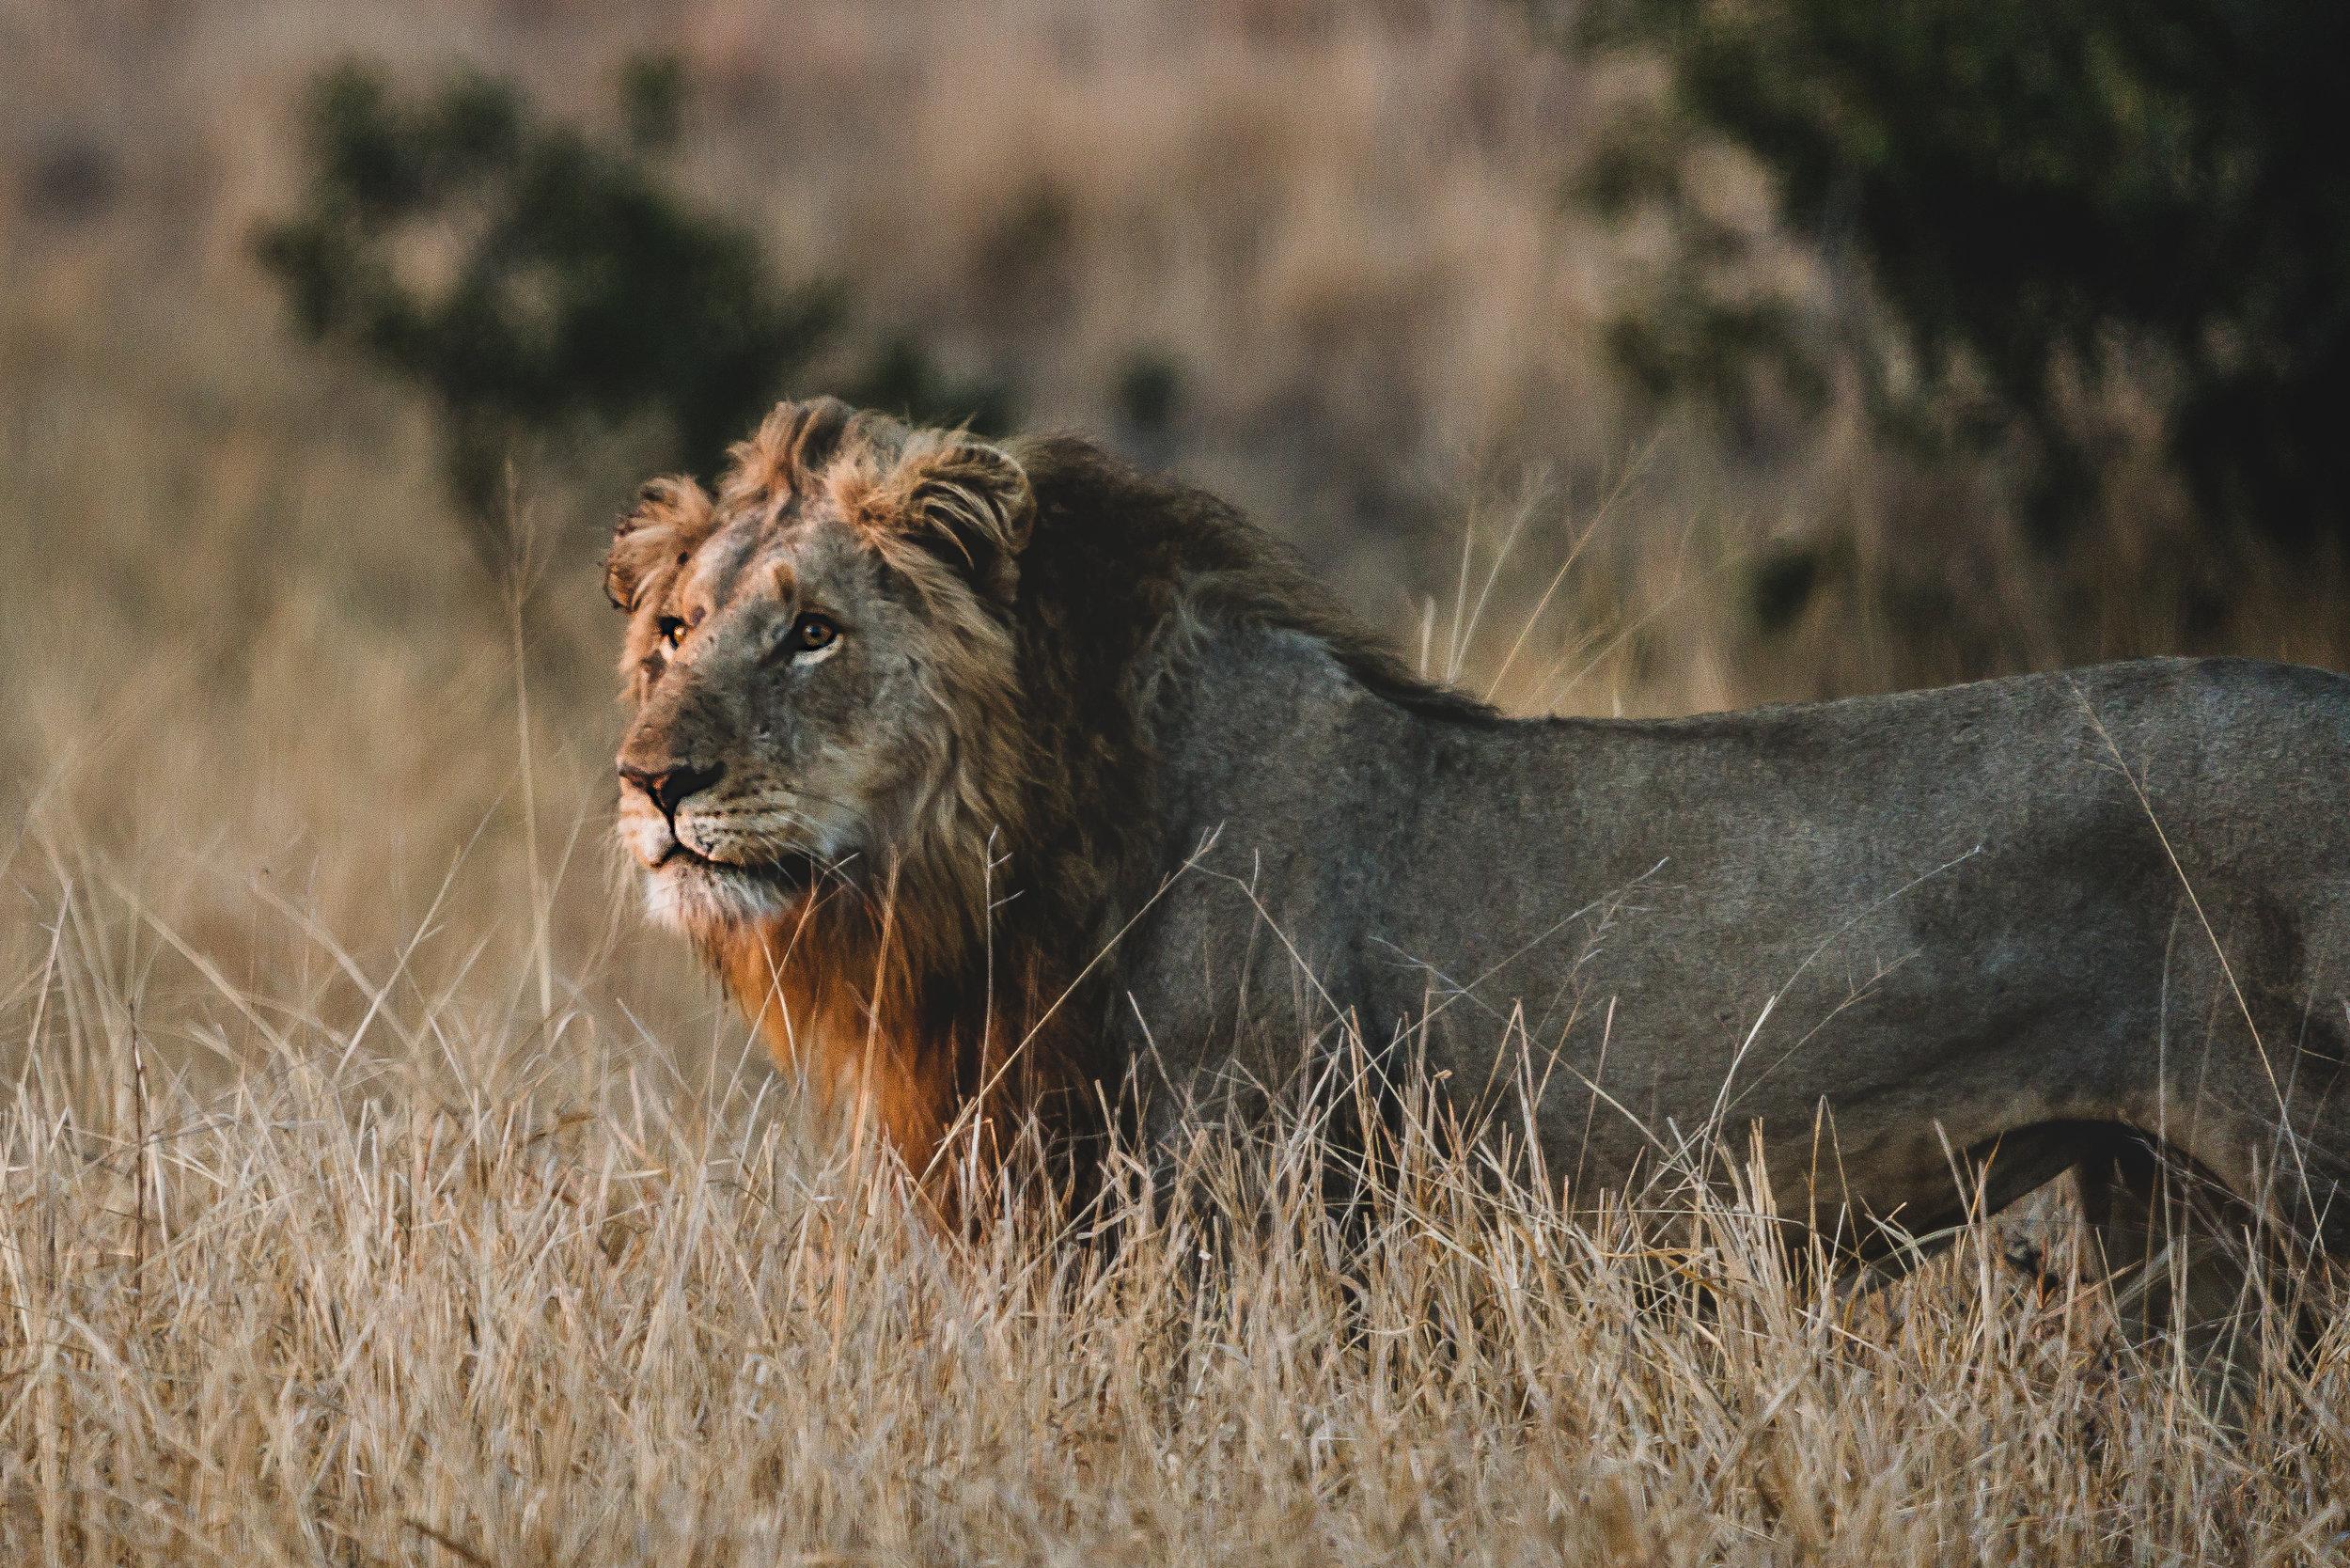 Landscapes by Jason Lanier Photography-Africa 2019-0003.jpg